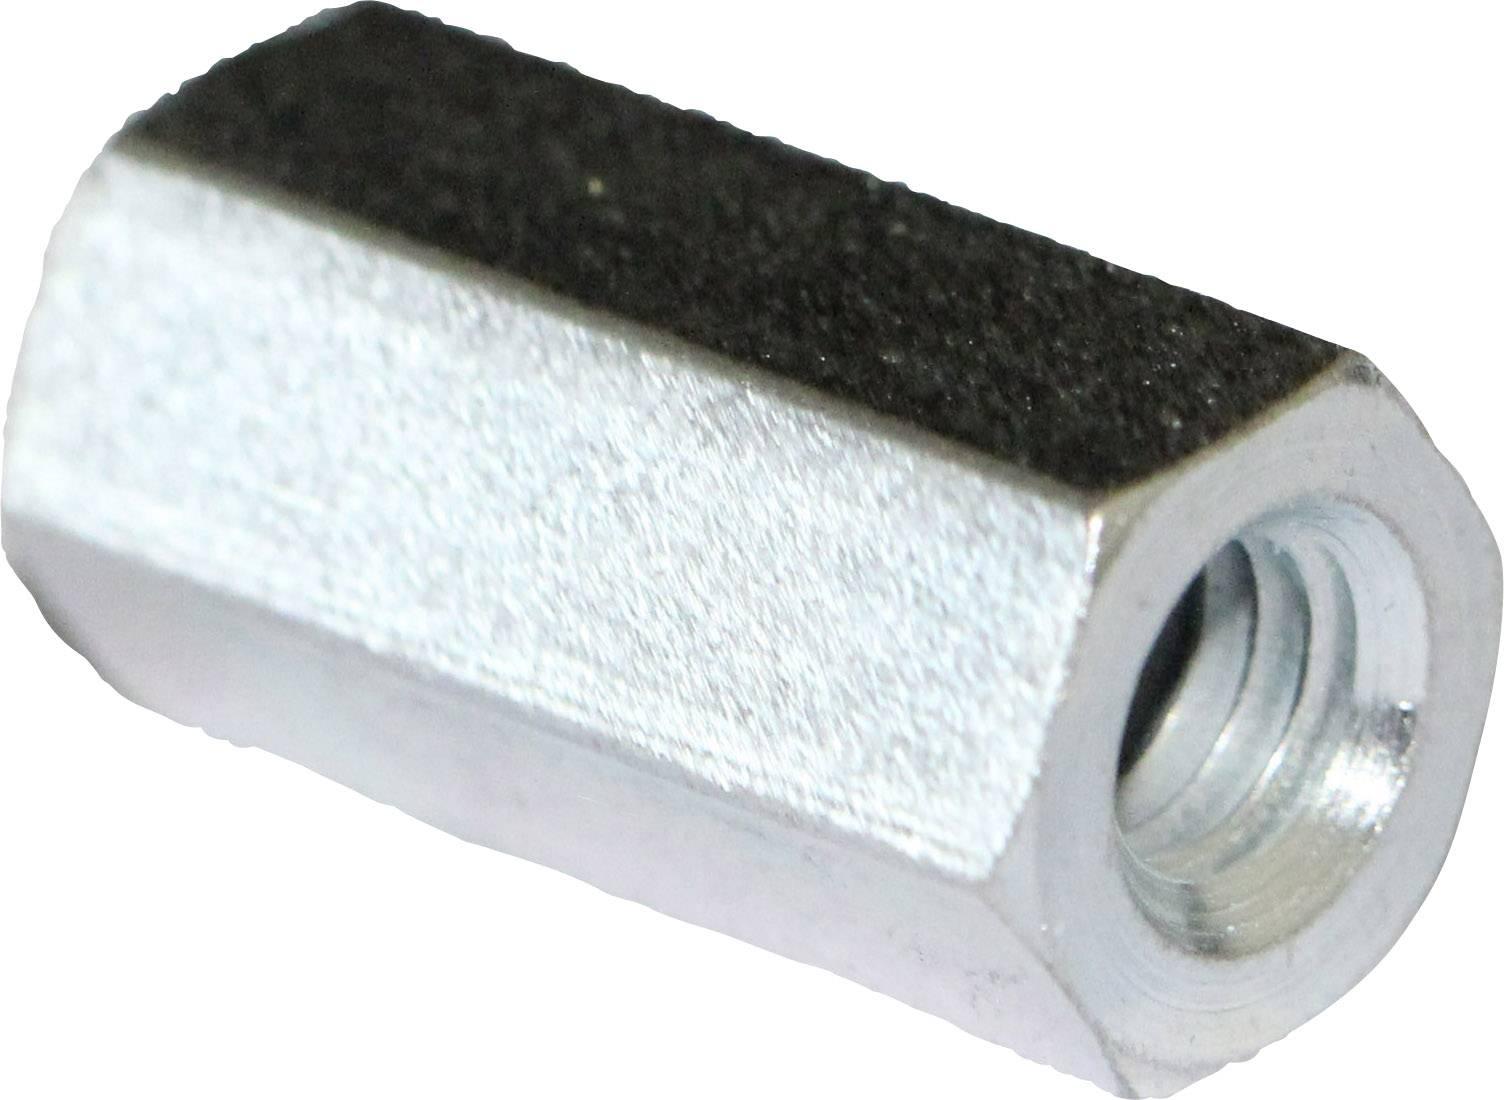 Distanční sloupek PB Fastener S57040X15, M4, 15 mm, 10 ks